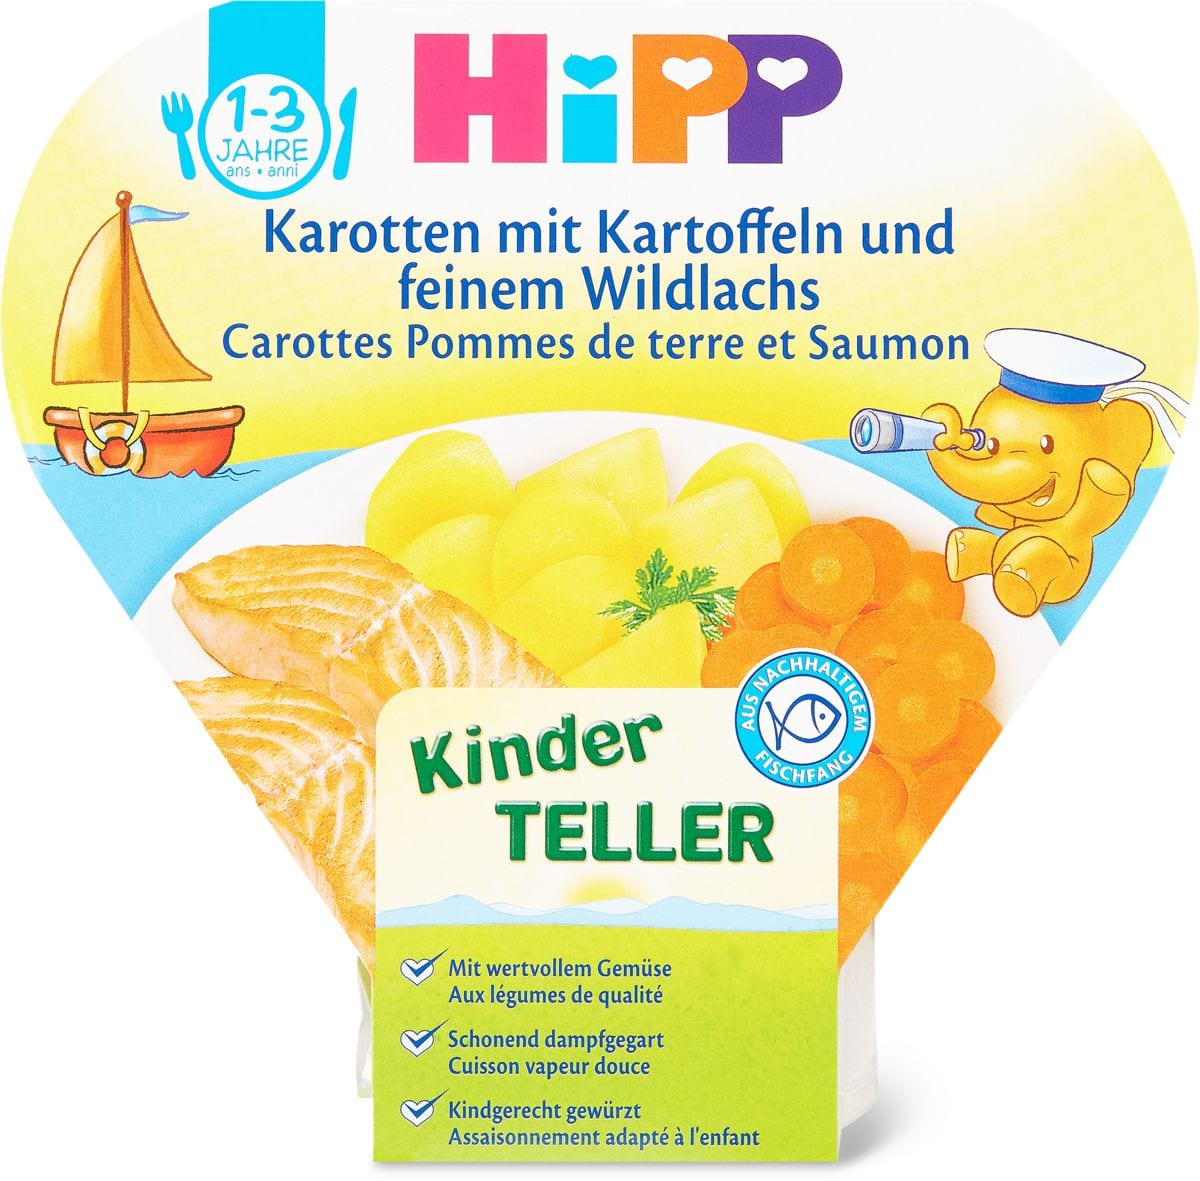 HiPP Kinderteller Karotten Kartoffeln Wildlachs